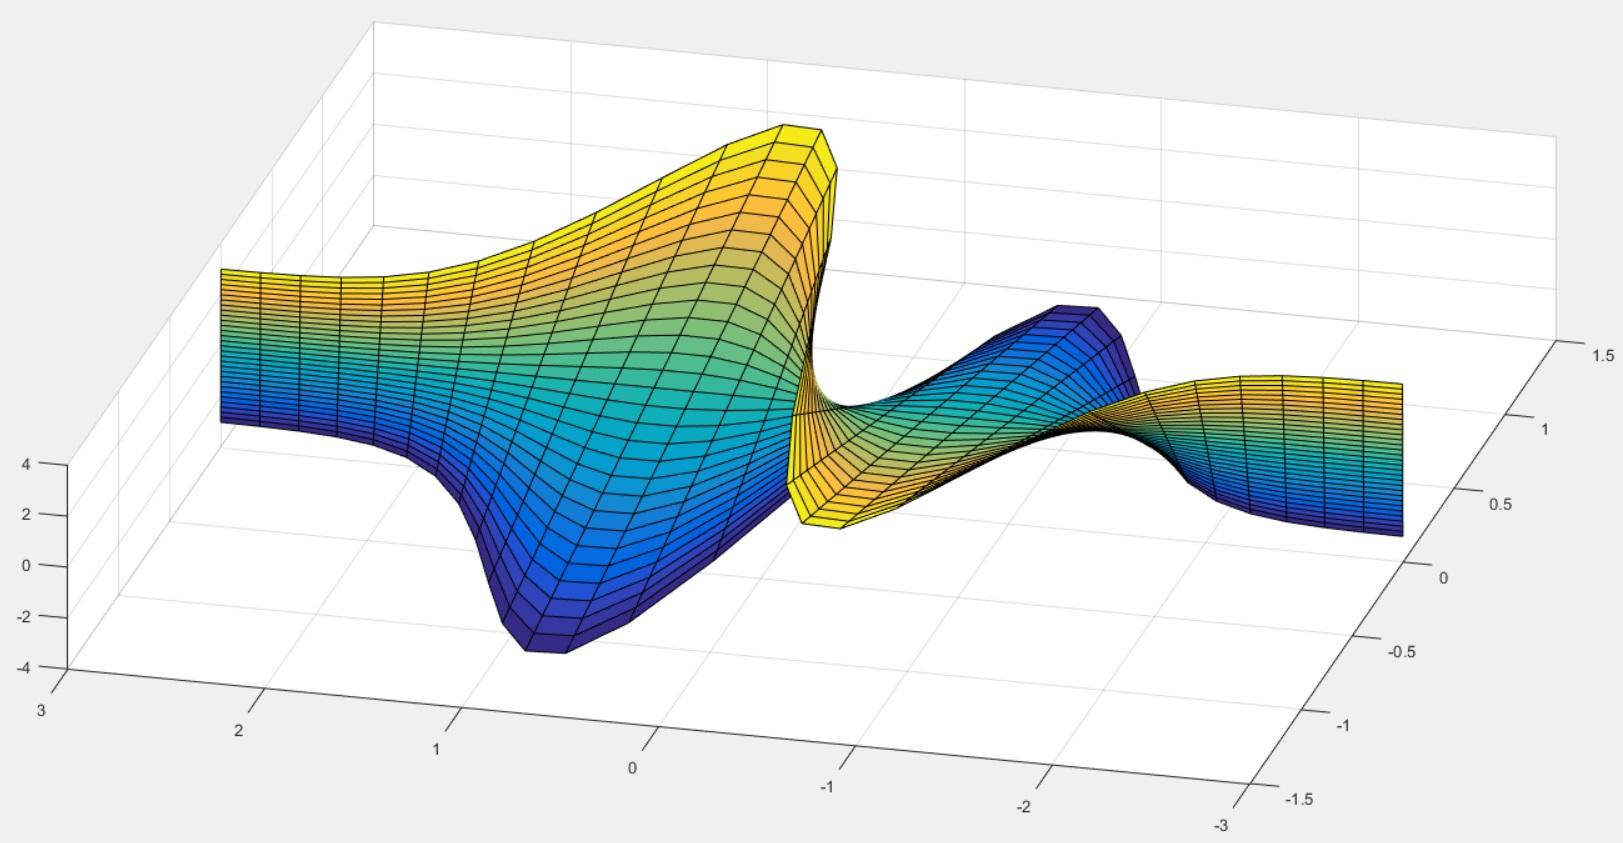 3d график функции